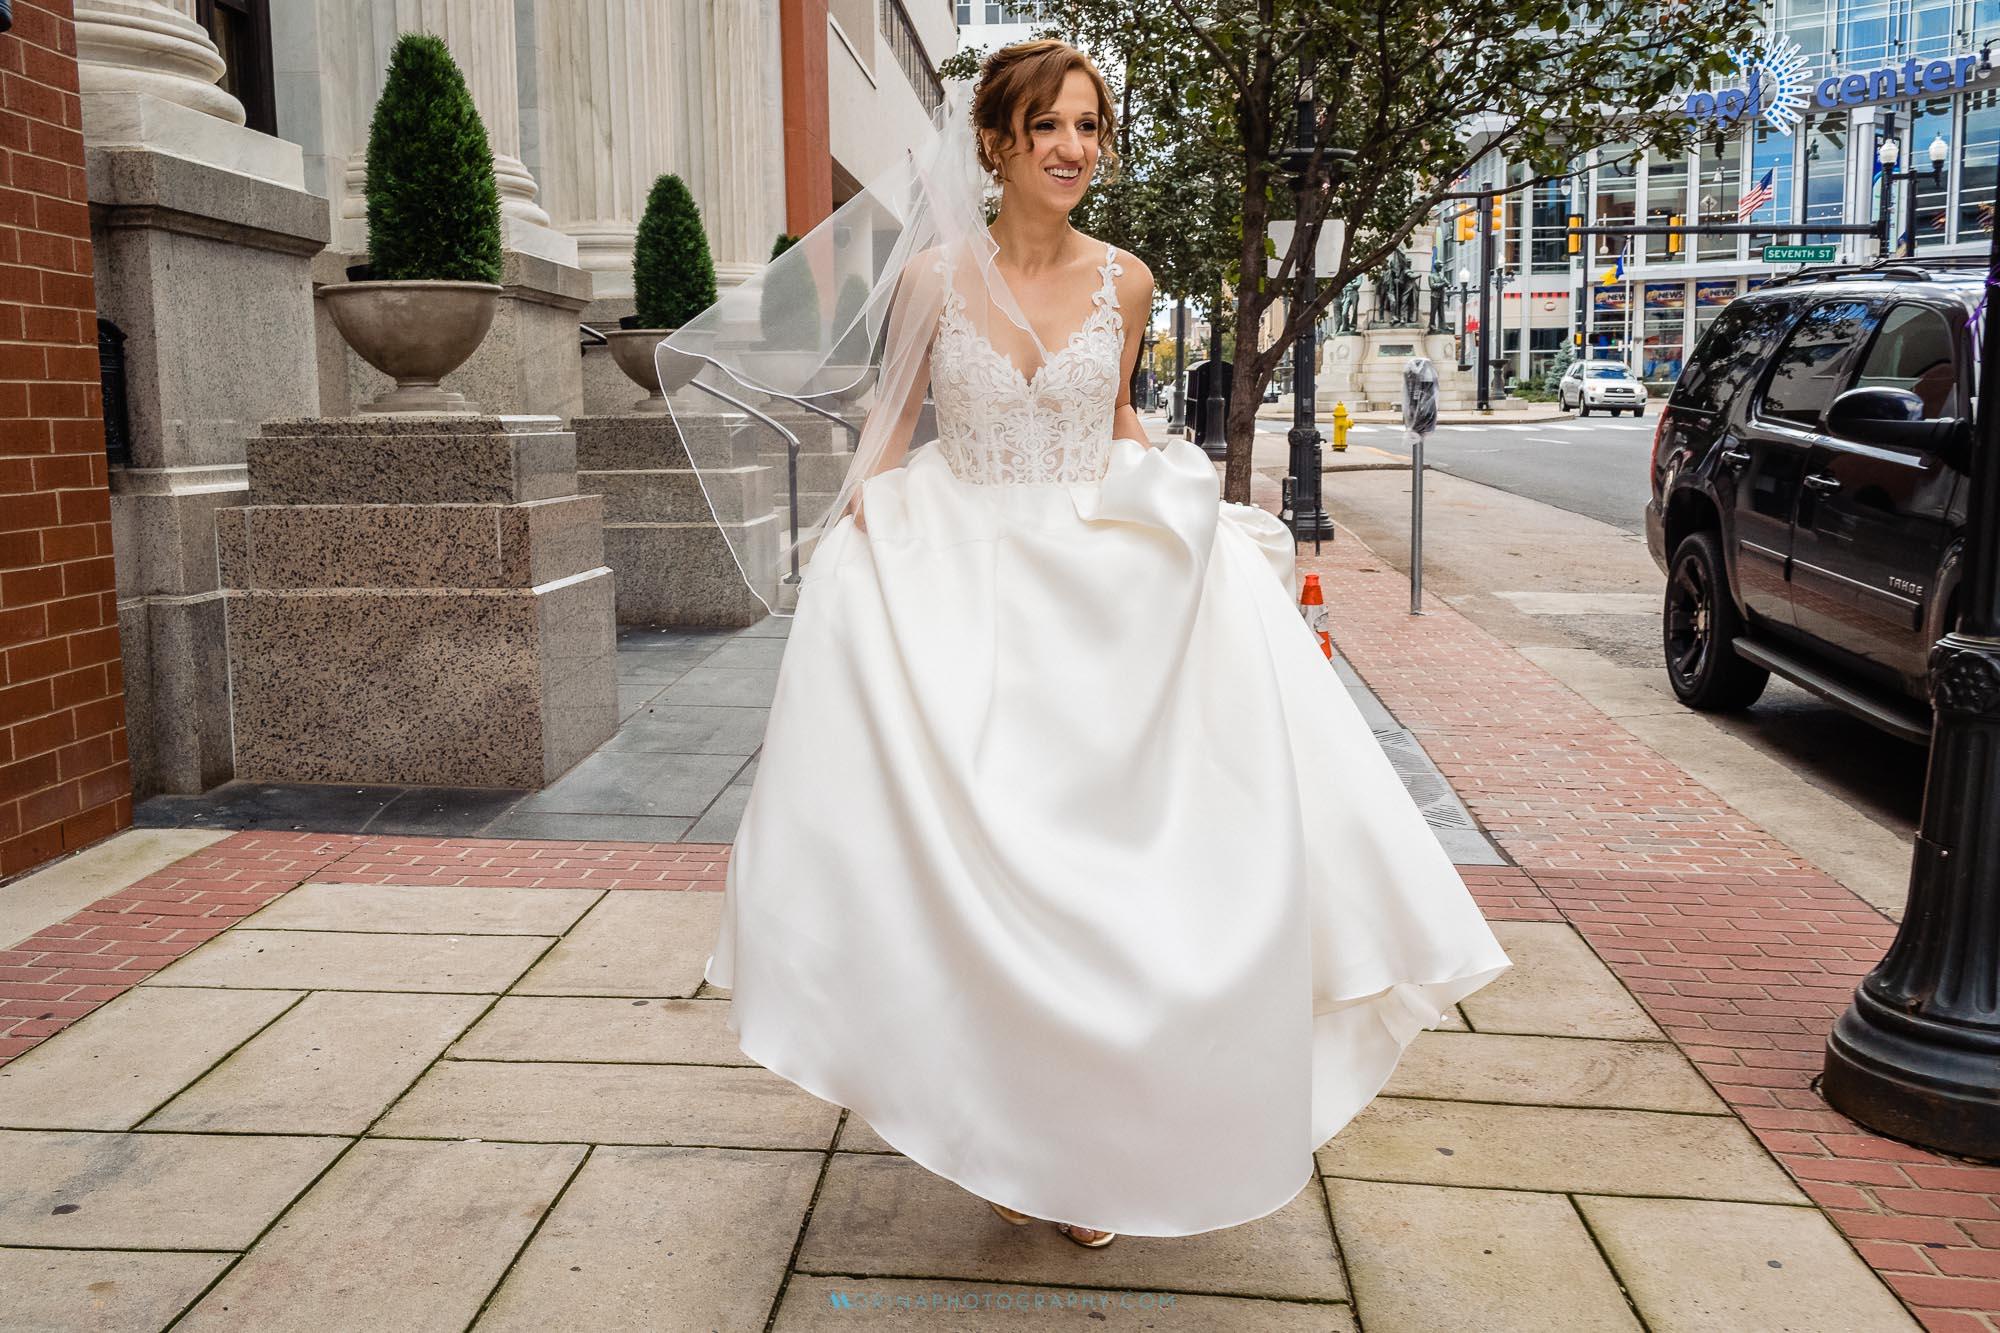 Ilhana & Jonathan Wedding at Vault 634 - Allentown 0029.jpg